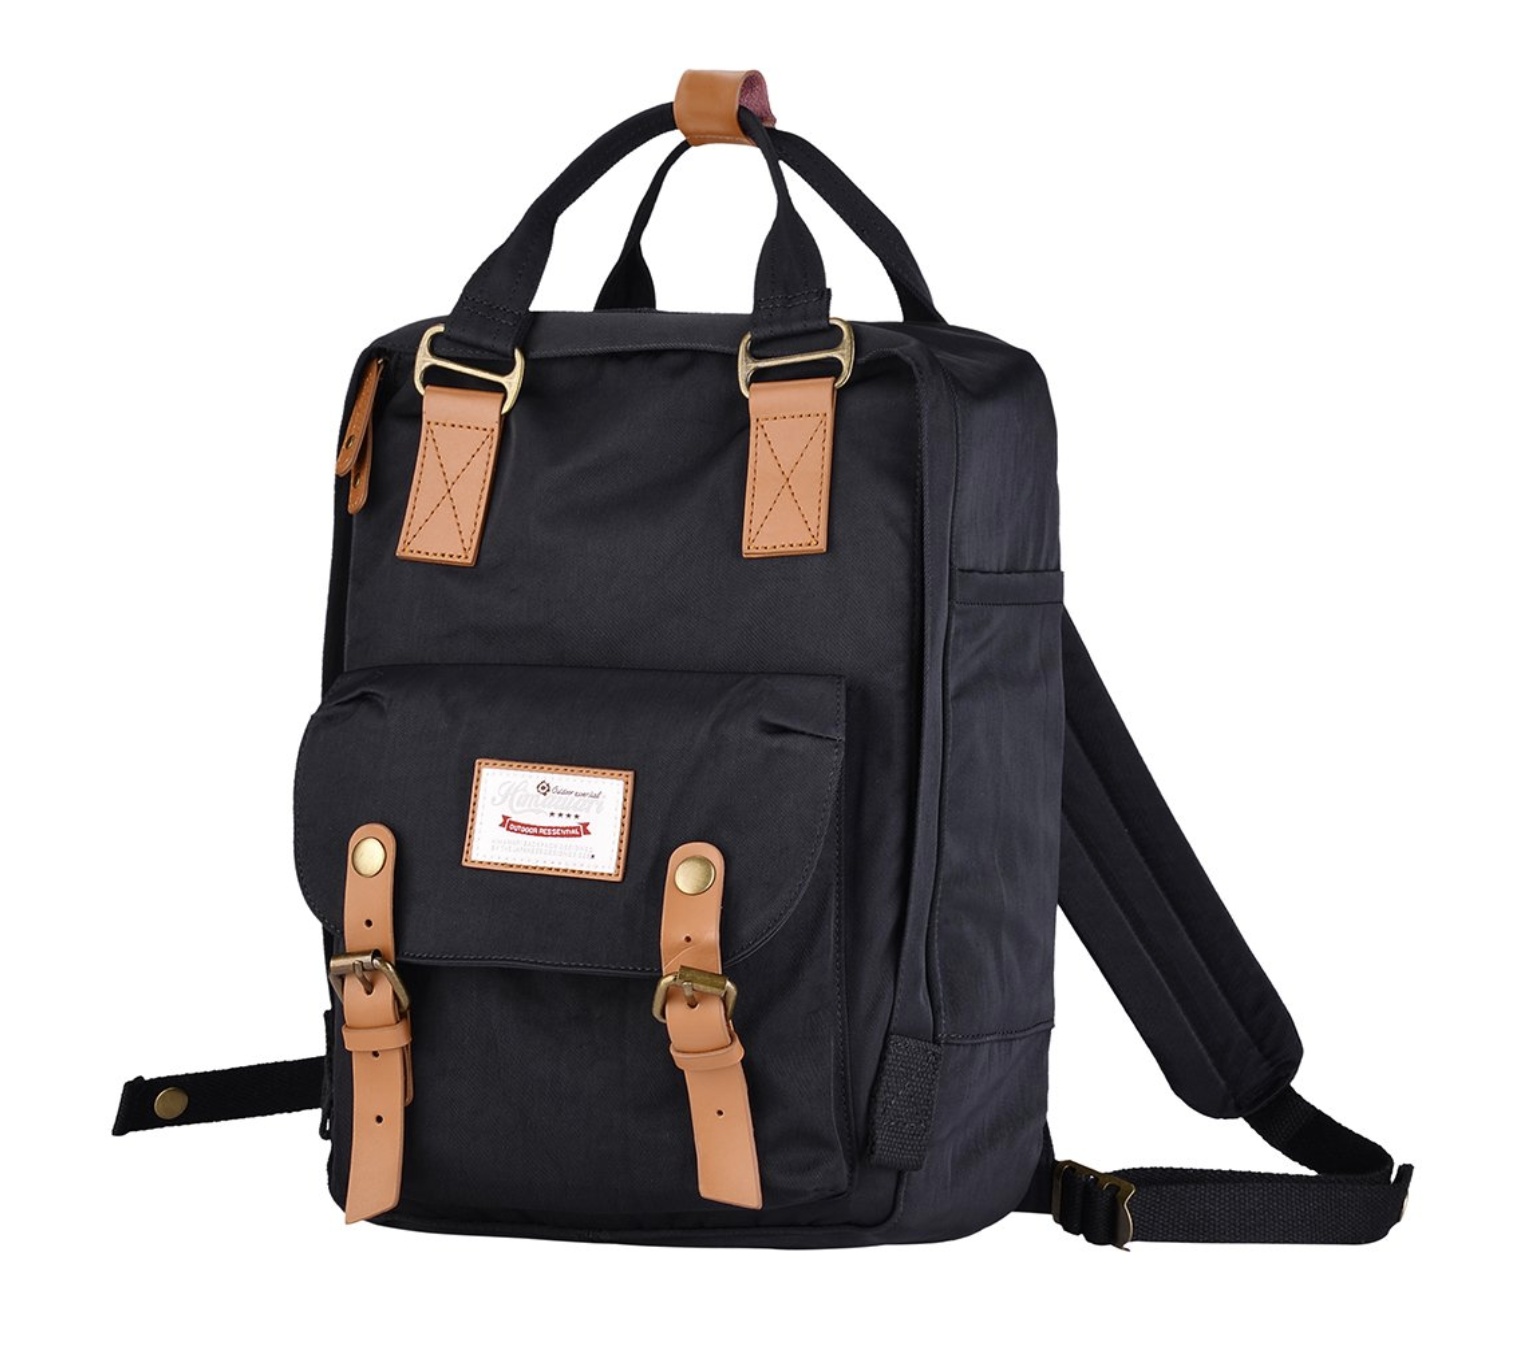 "Himawari School Functional Travel Waterproof Backpack Bag for Men & Women | 14.9""x11.1""x5.9"" | Holds 13-in Laptop (Black)"